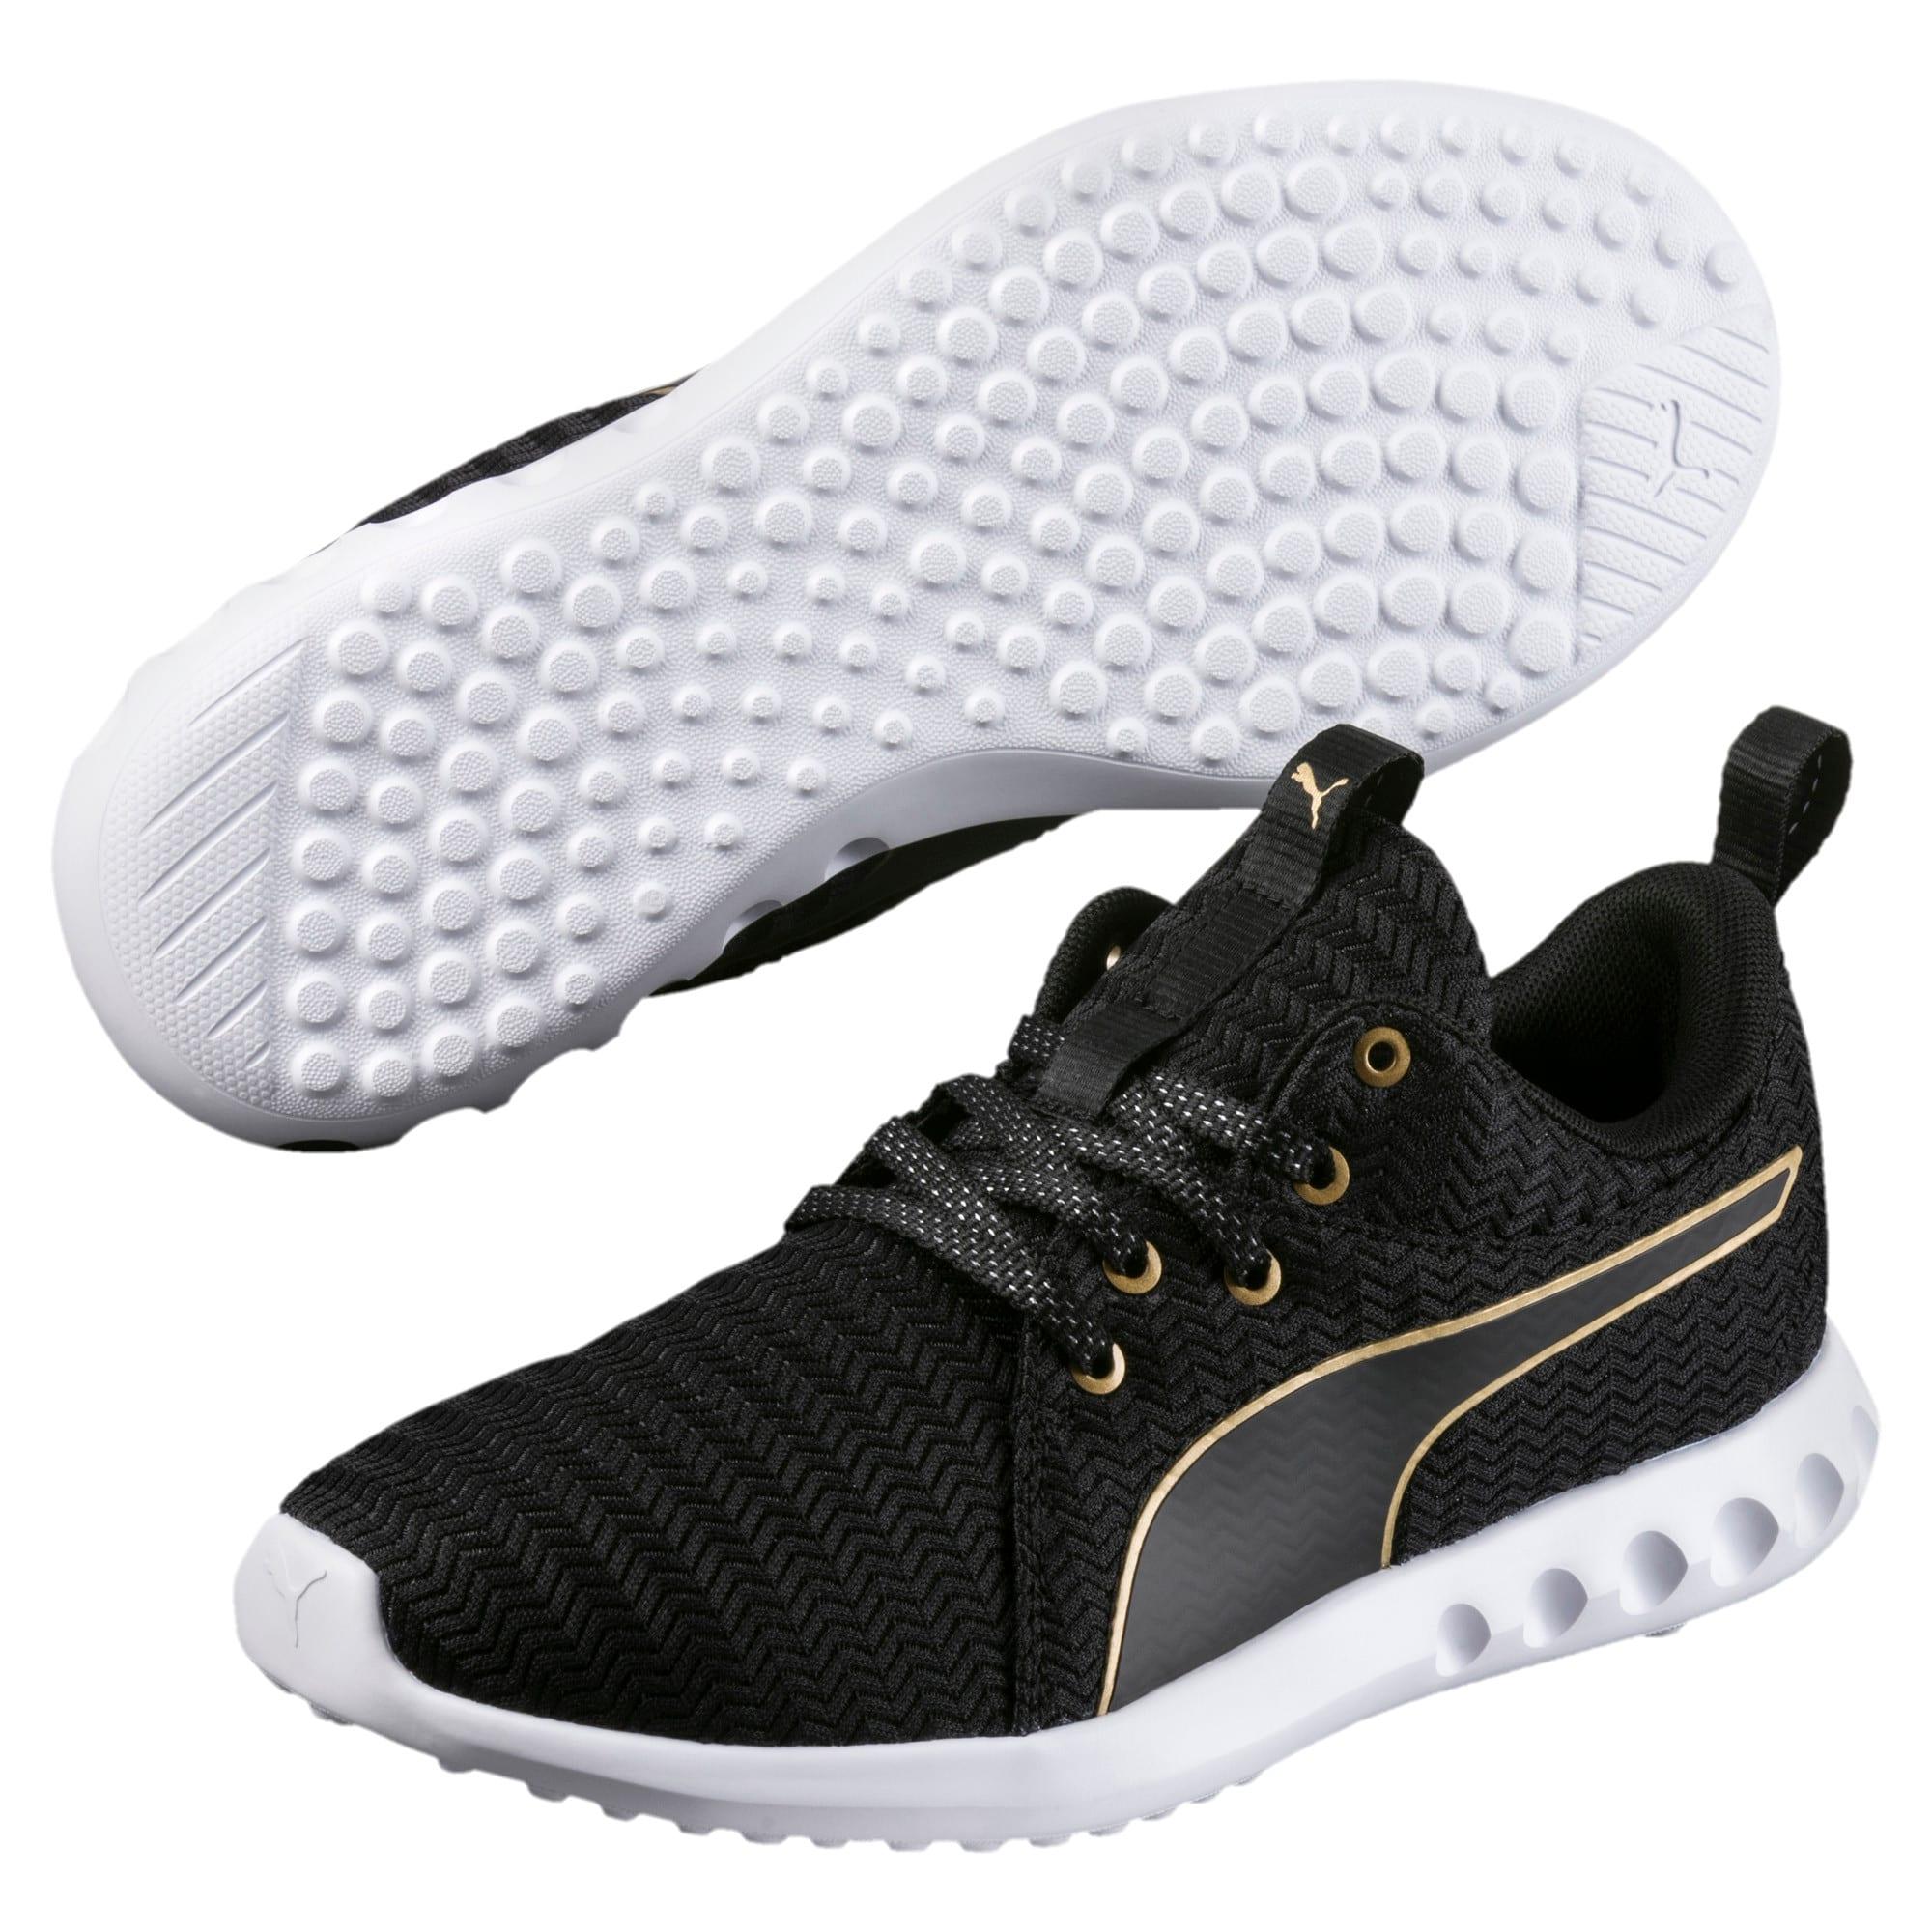 Thumbnail 2 of Carson 2 Metallic Women's Running Shoes, Puma Black-Gold, medium